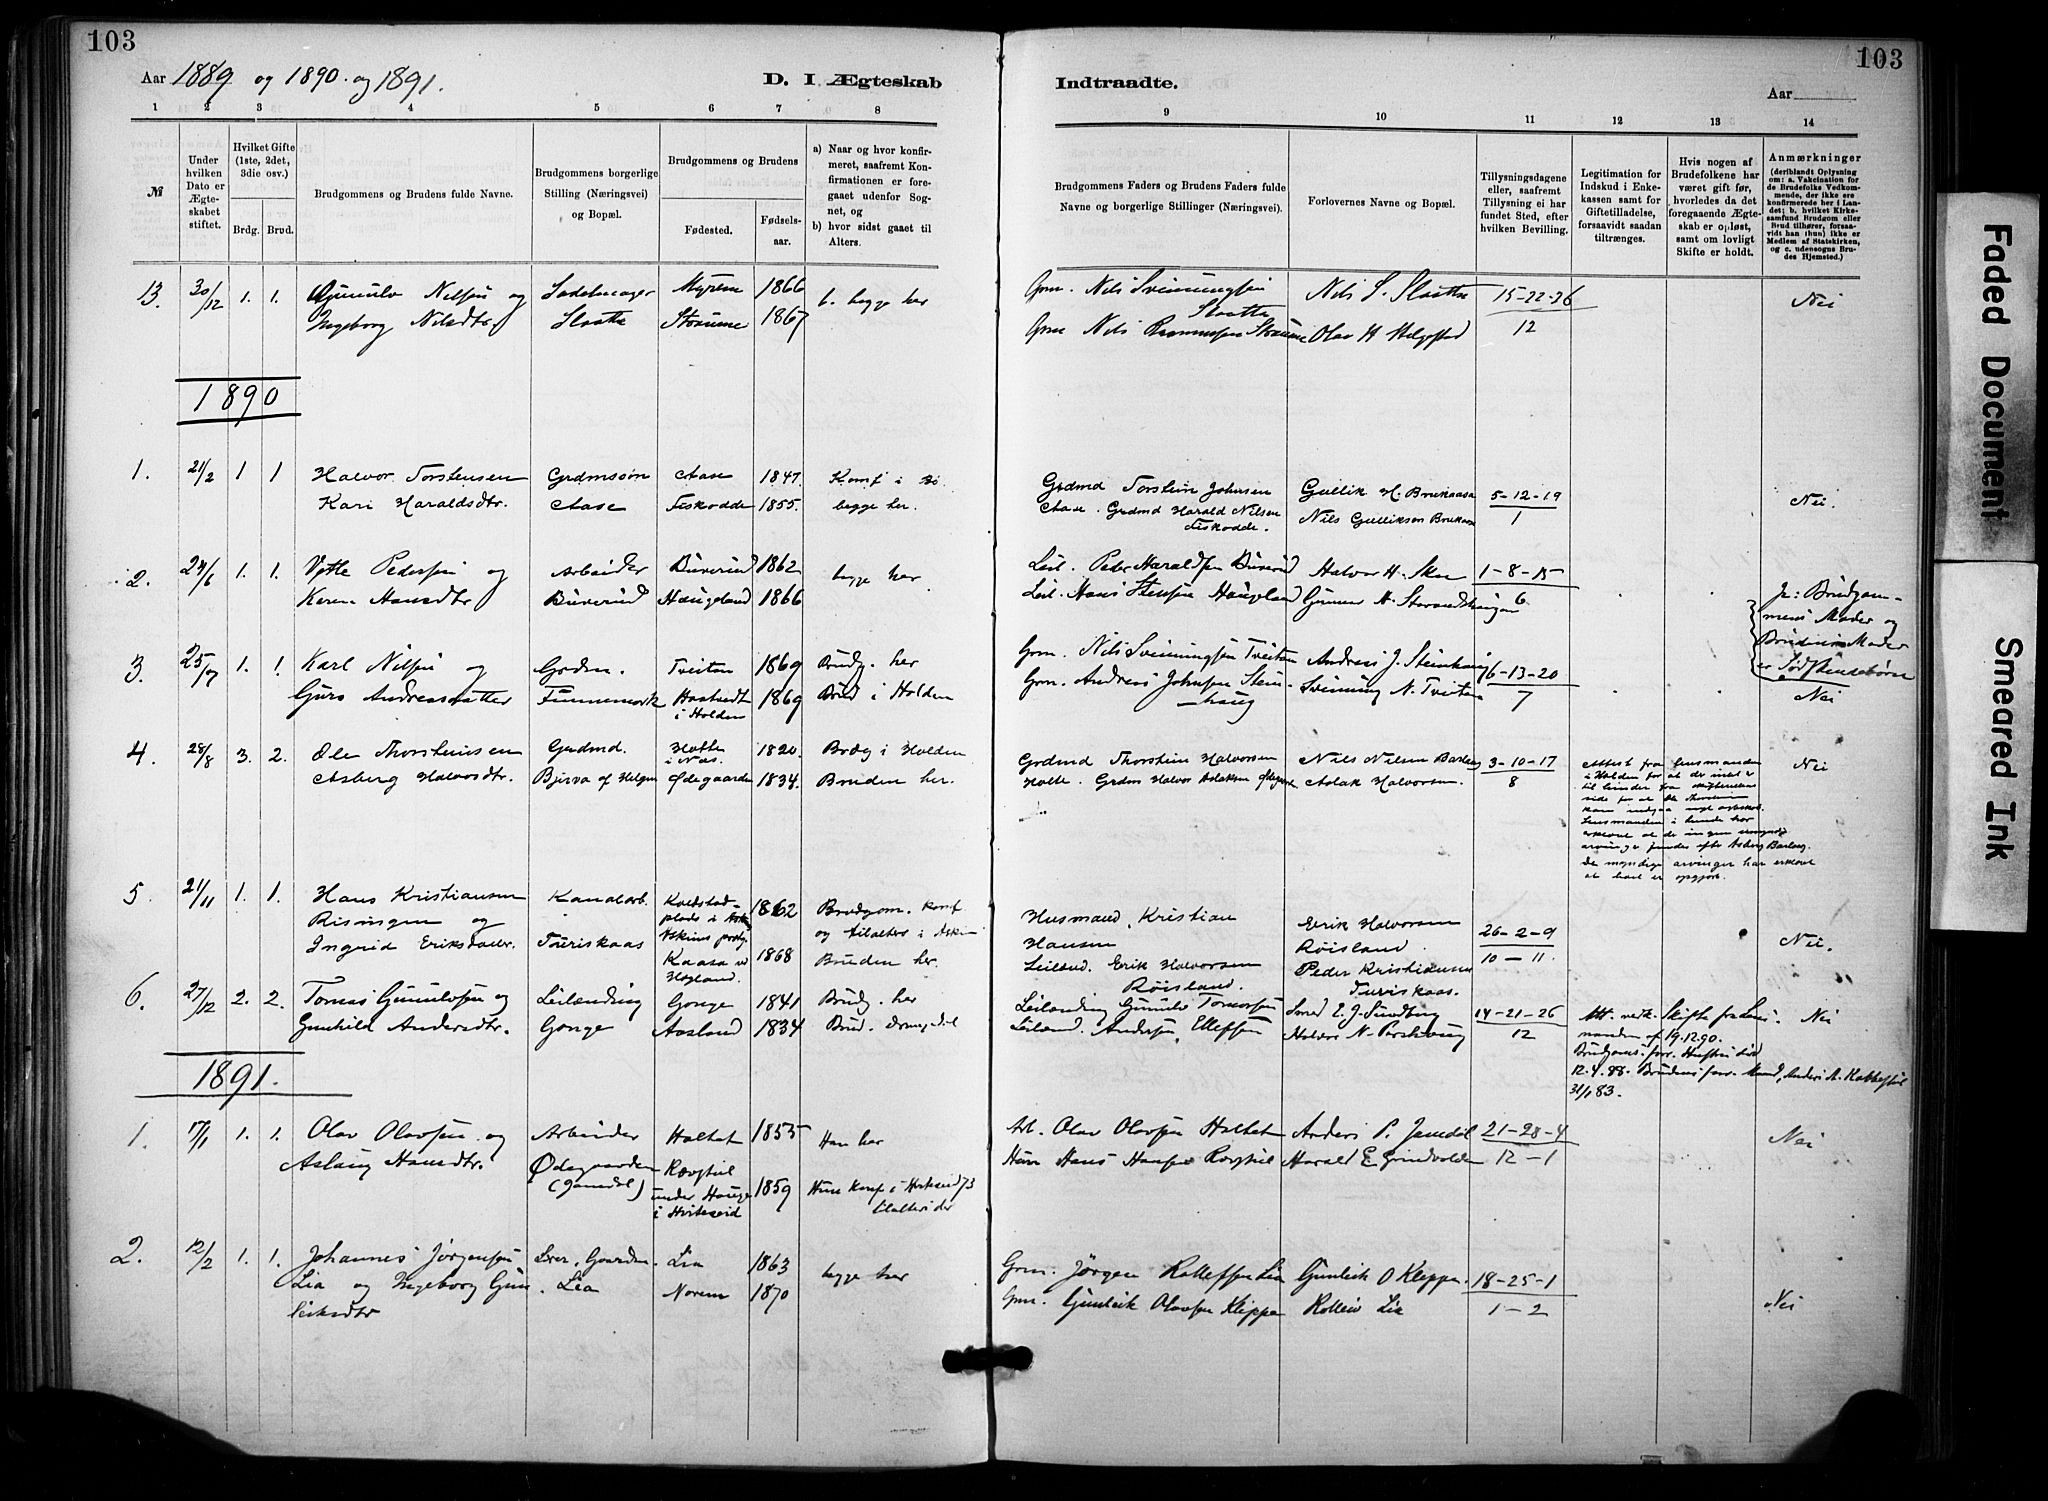 SAKO, Lunde kirkebøker, F/Fa/L0002: Ministerialbok nr. I 2, 1884-1892, s. 103